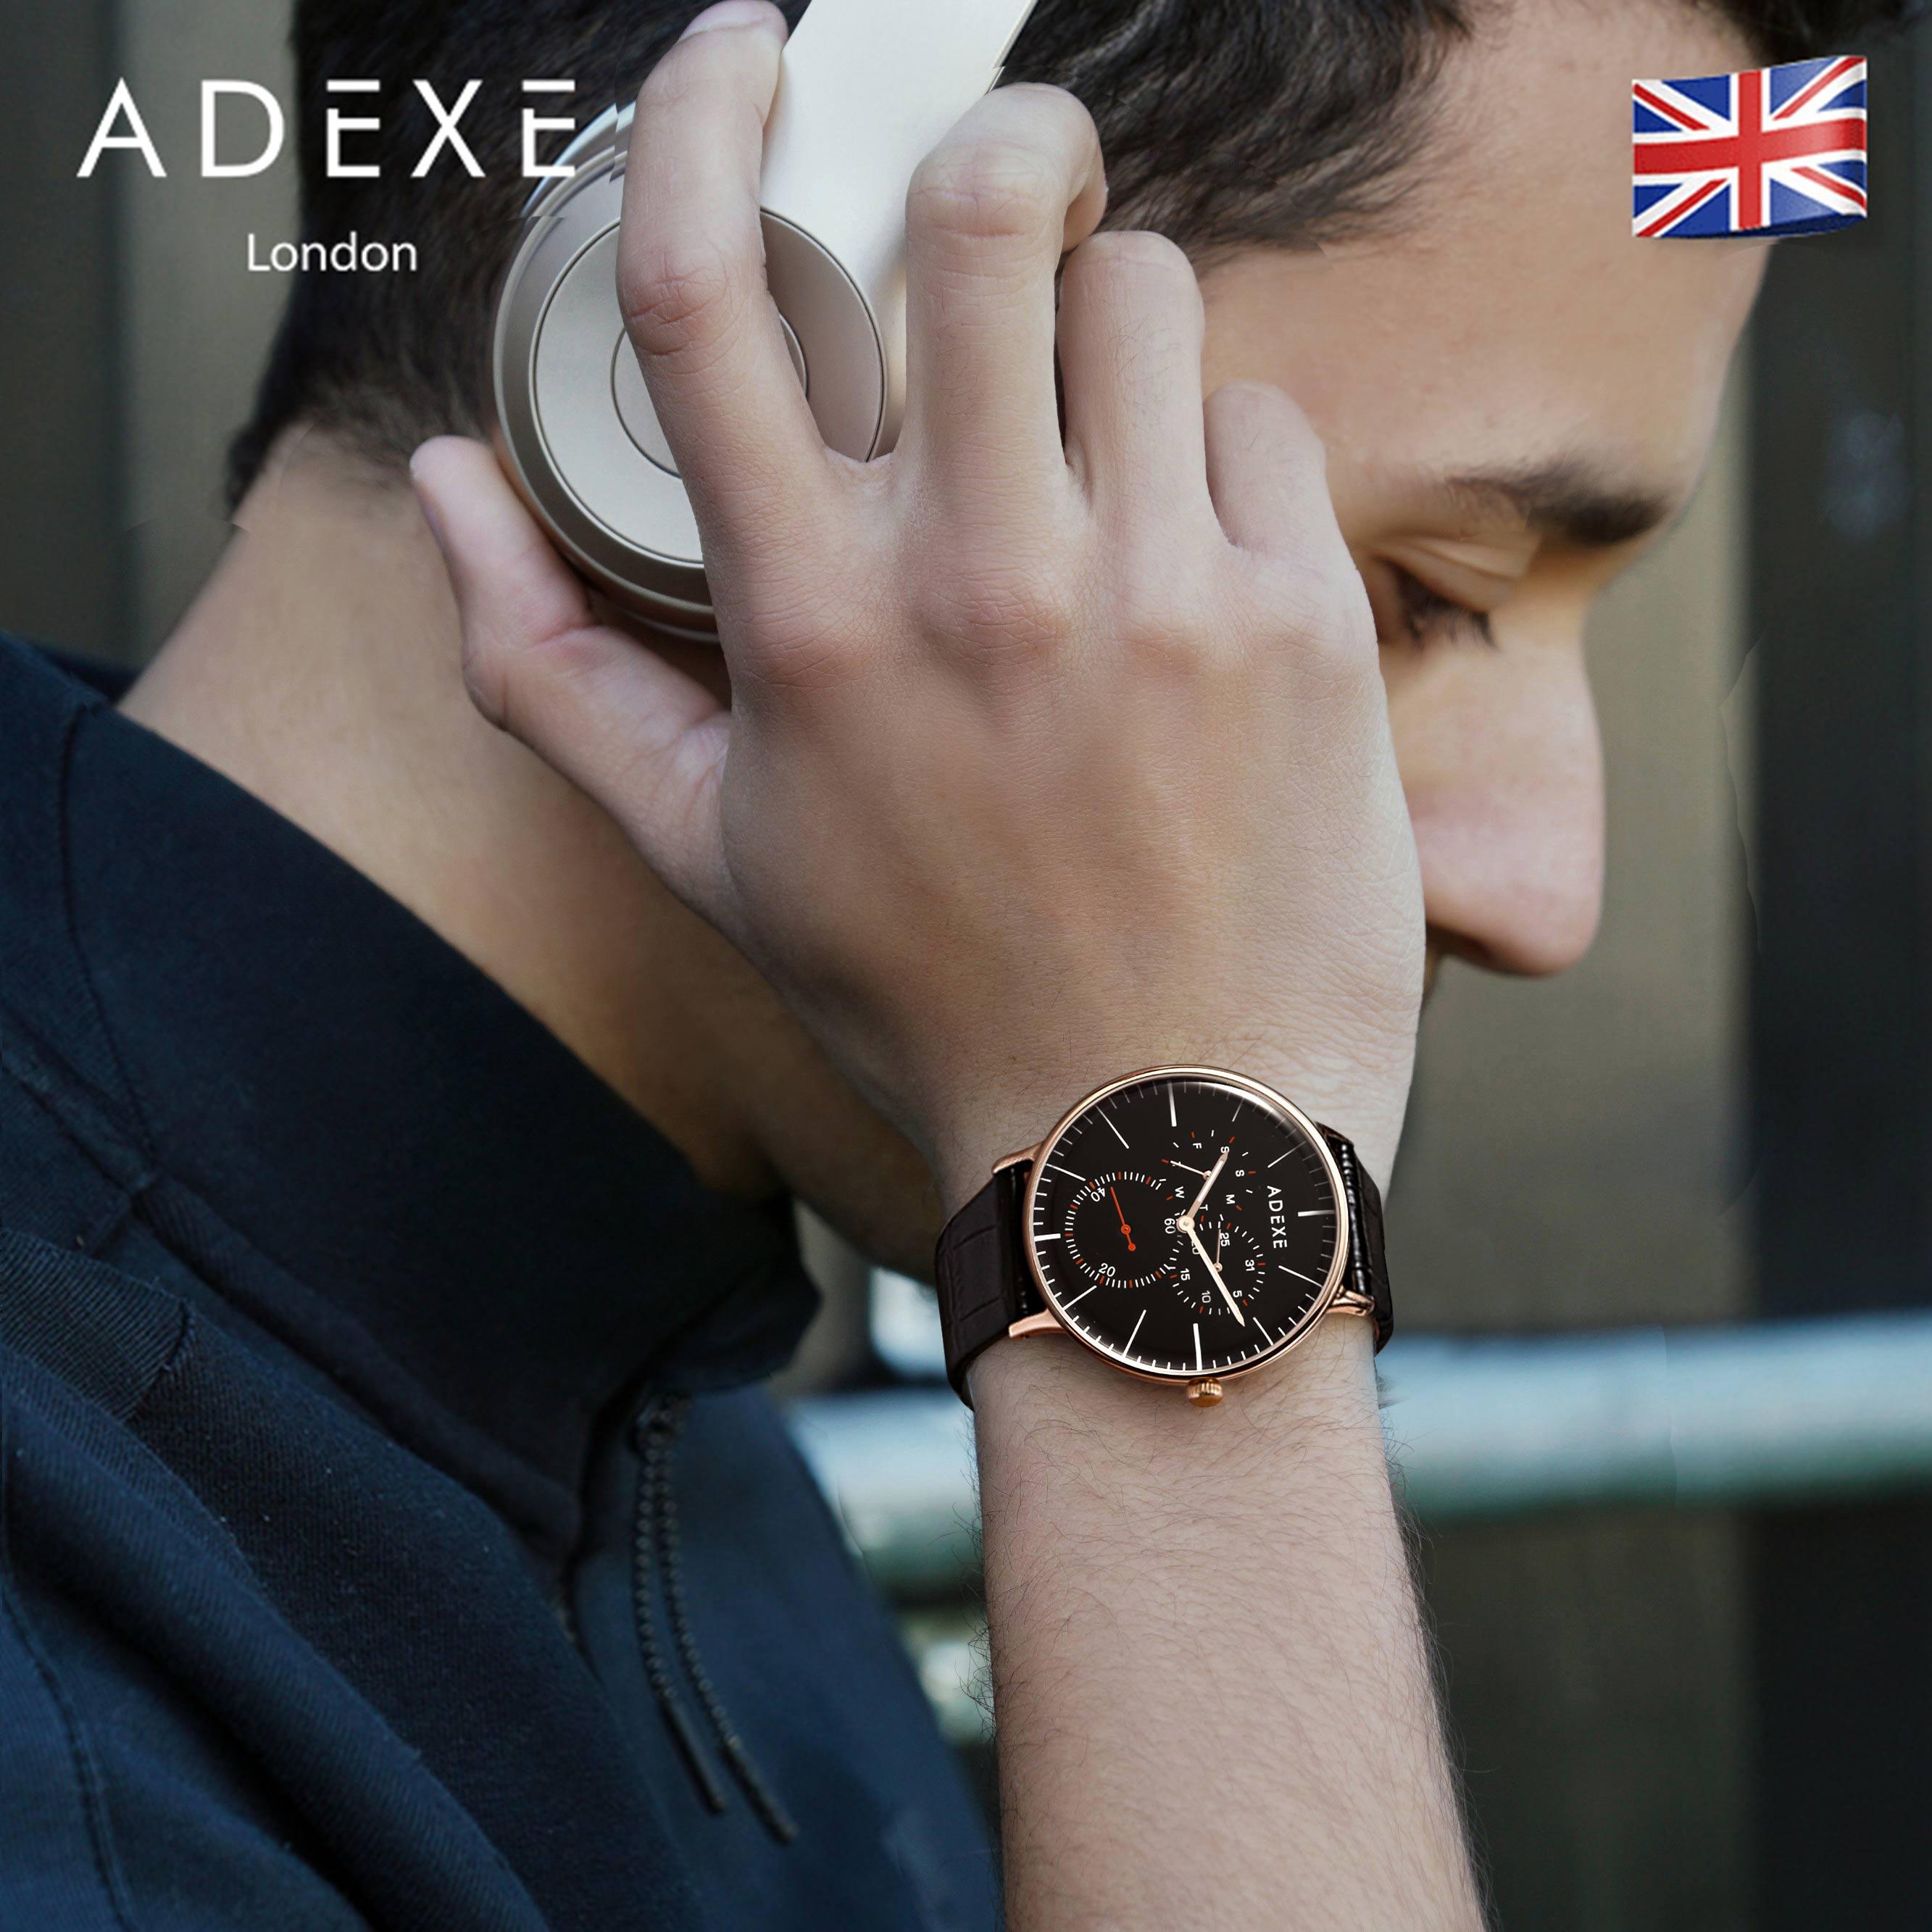 ADEXE男士手表正品时尚英国手表三眼防水多功能情侣手表男石英表